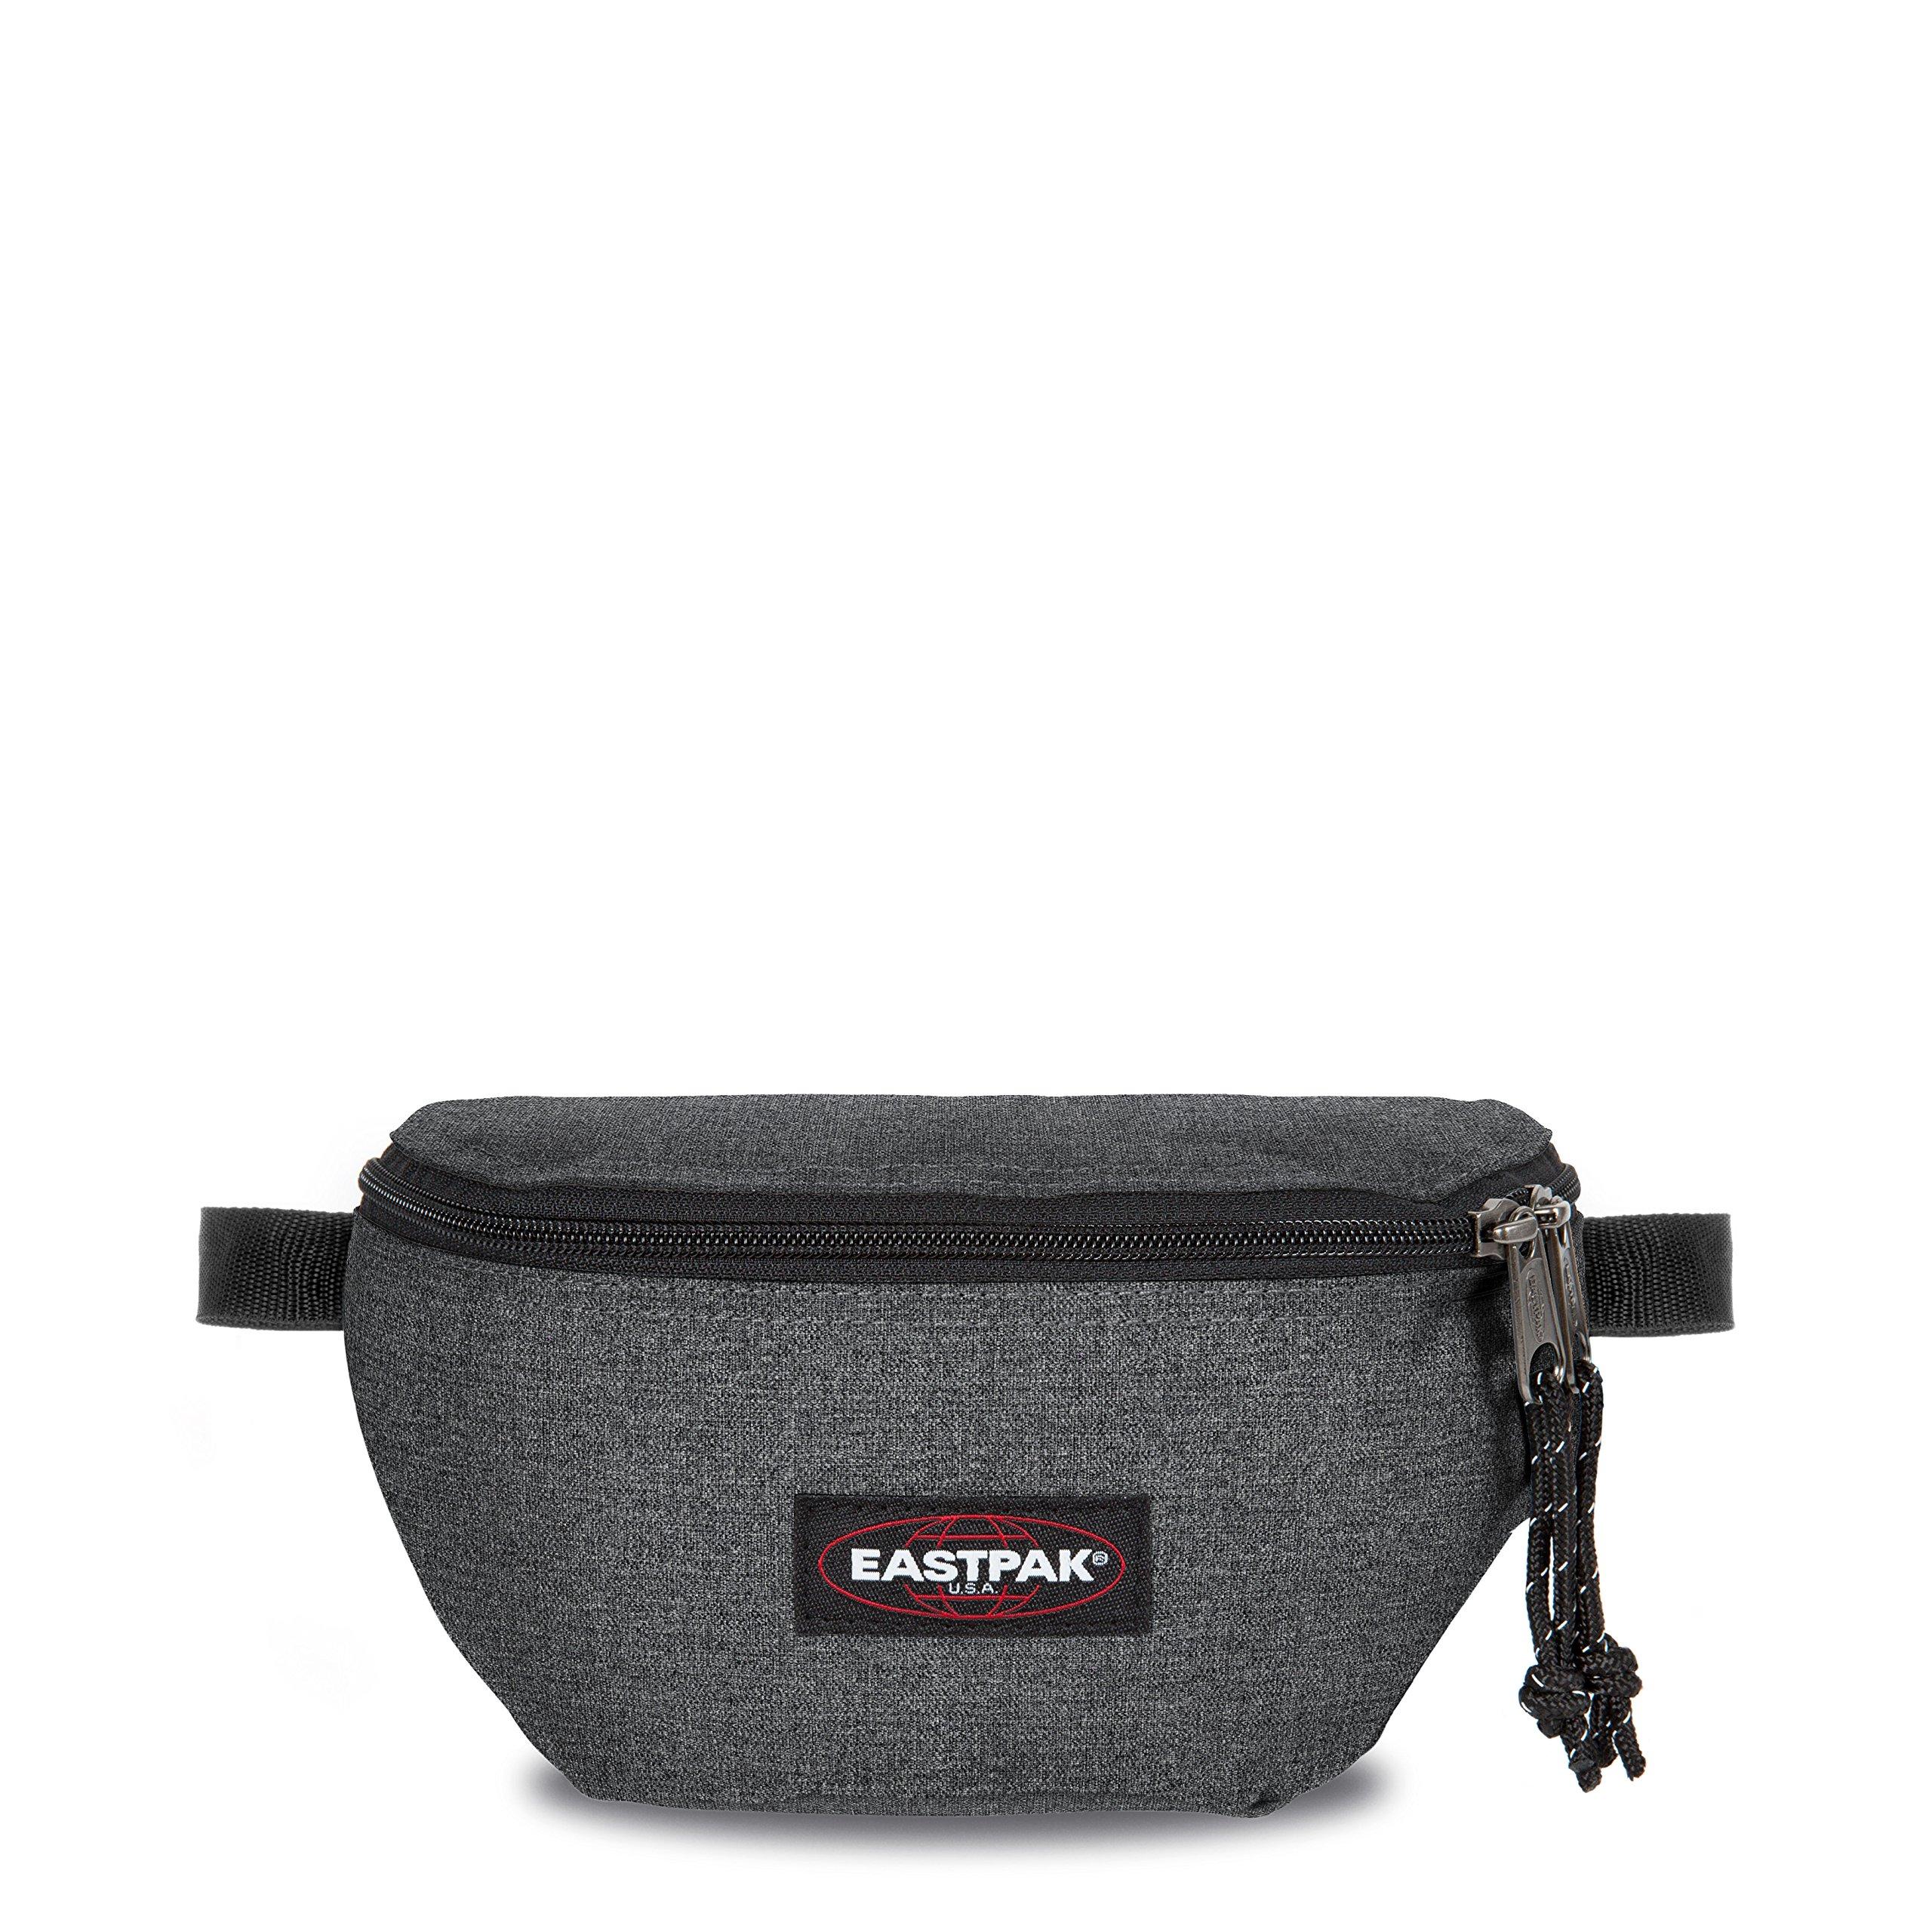 Eastpak Springer Riñonera, 23 cm, 2 L, Gris (Black Denim) product